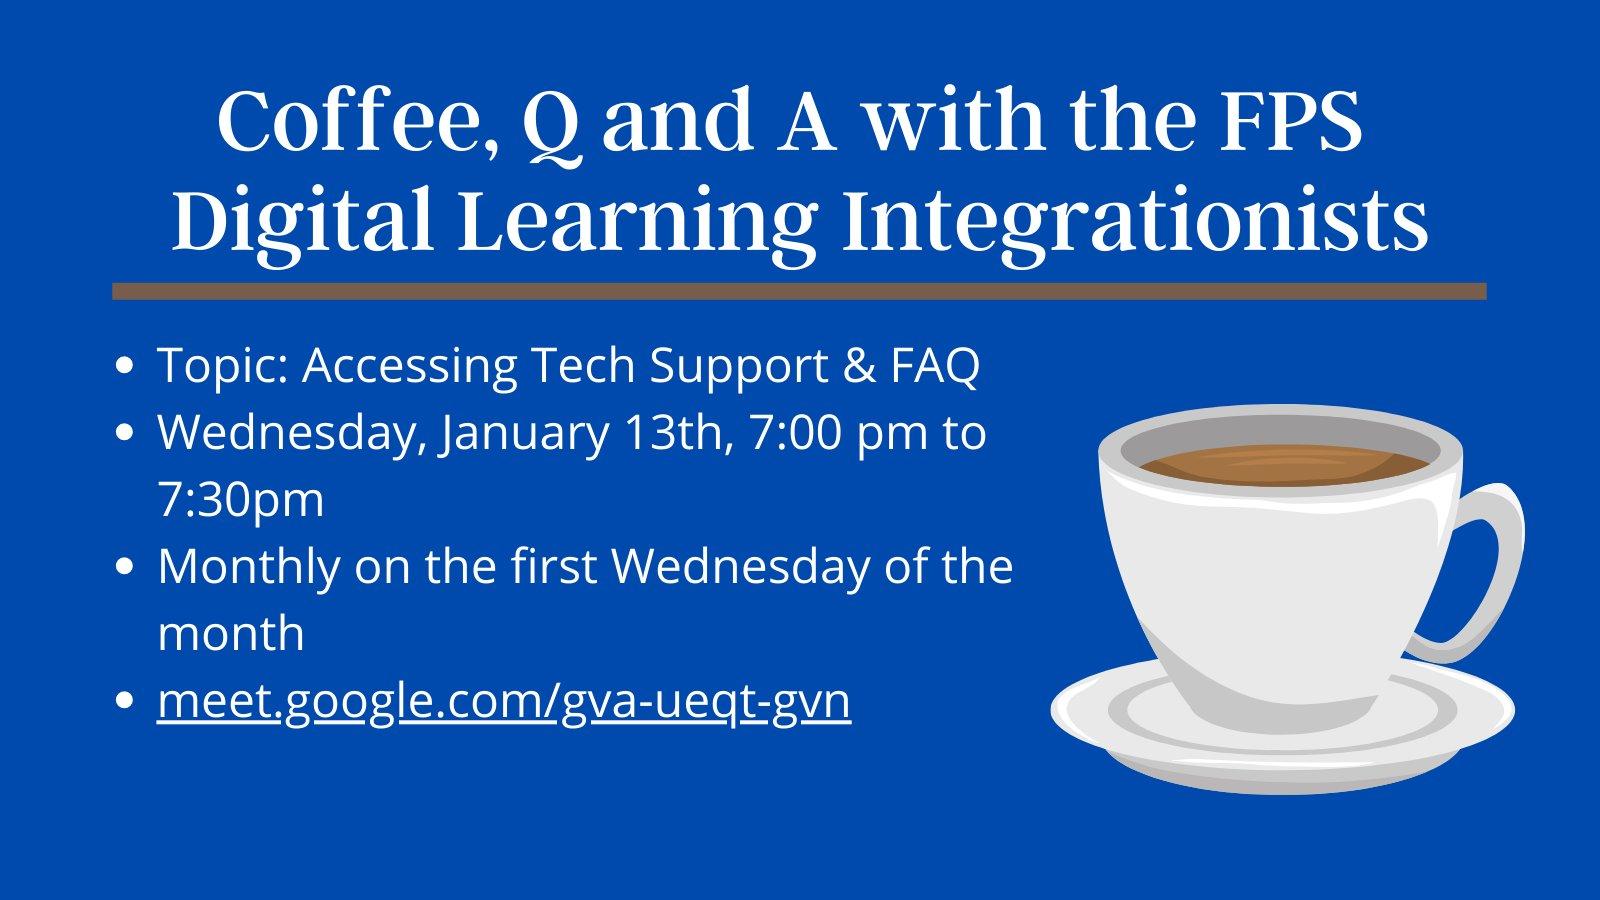 Digital Learning Integrationists (DLI) Team - Coffee Q & A - Jan 13, 2021